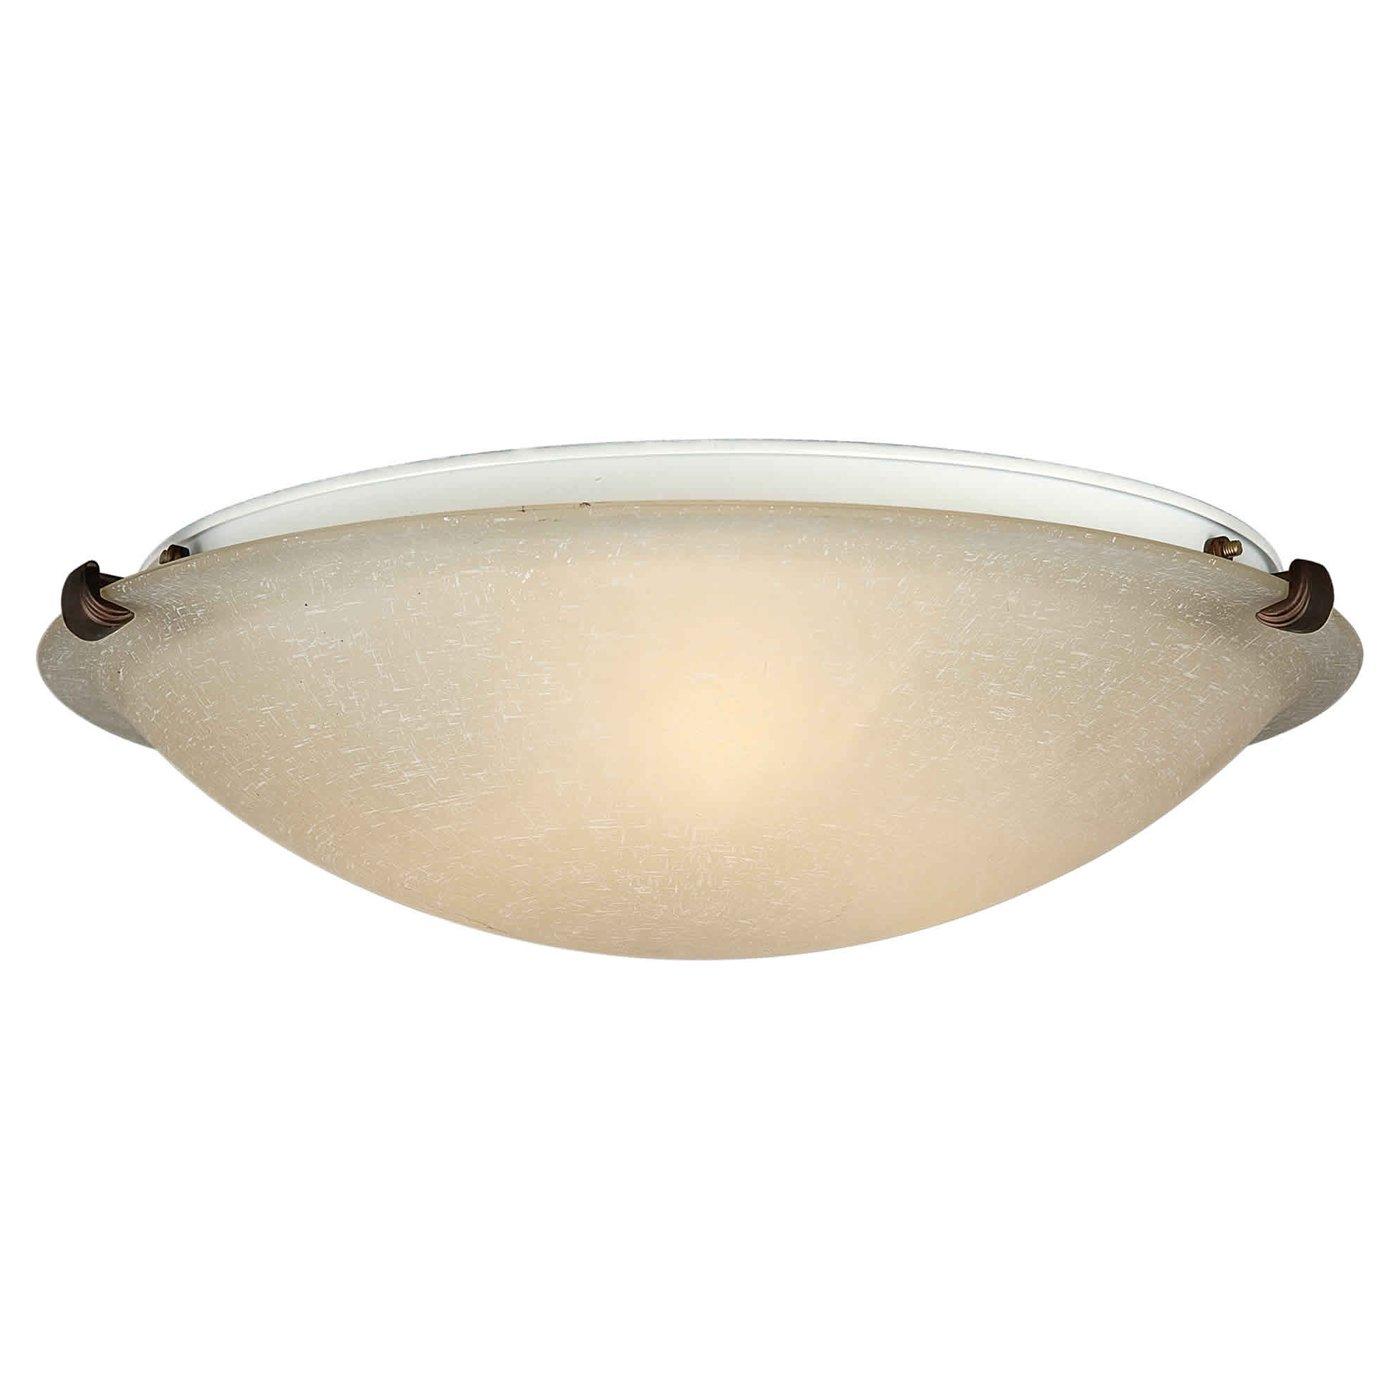 Flush mount fluorescent kitchen lighting Photo - 1